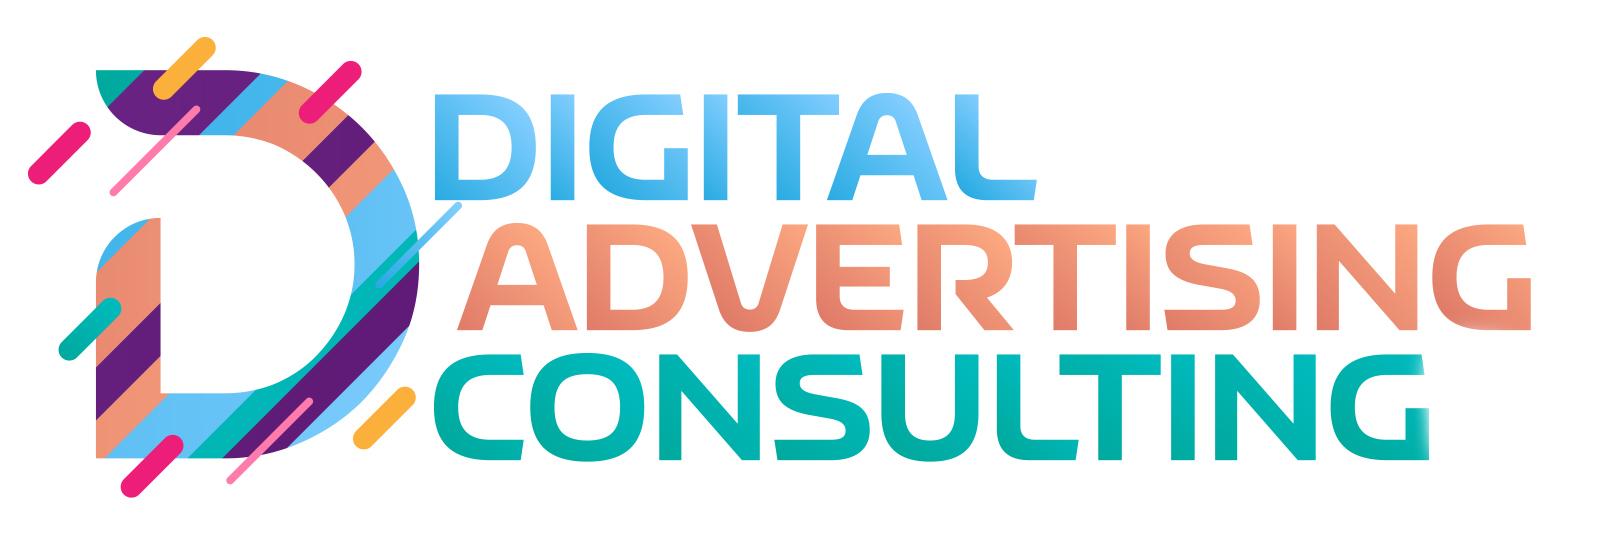 Digital Advertising Consulting Washington D.C.